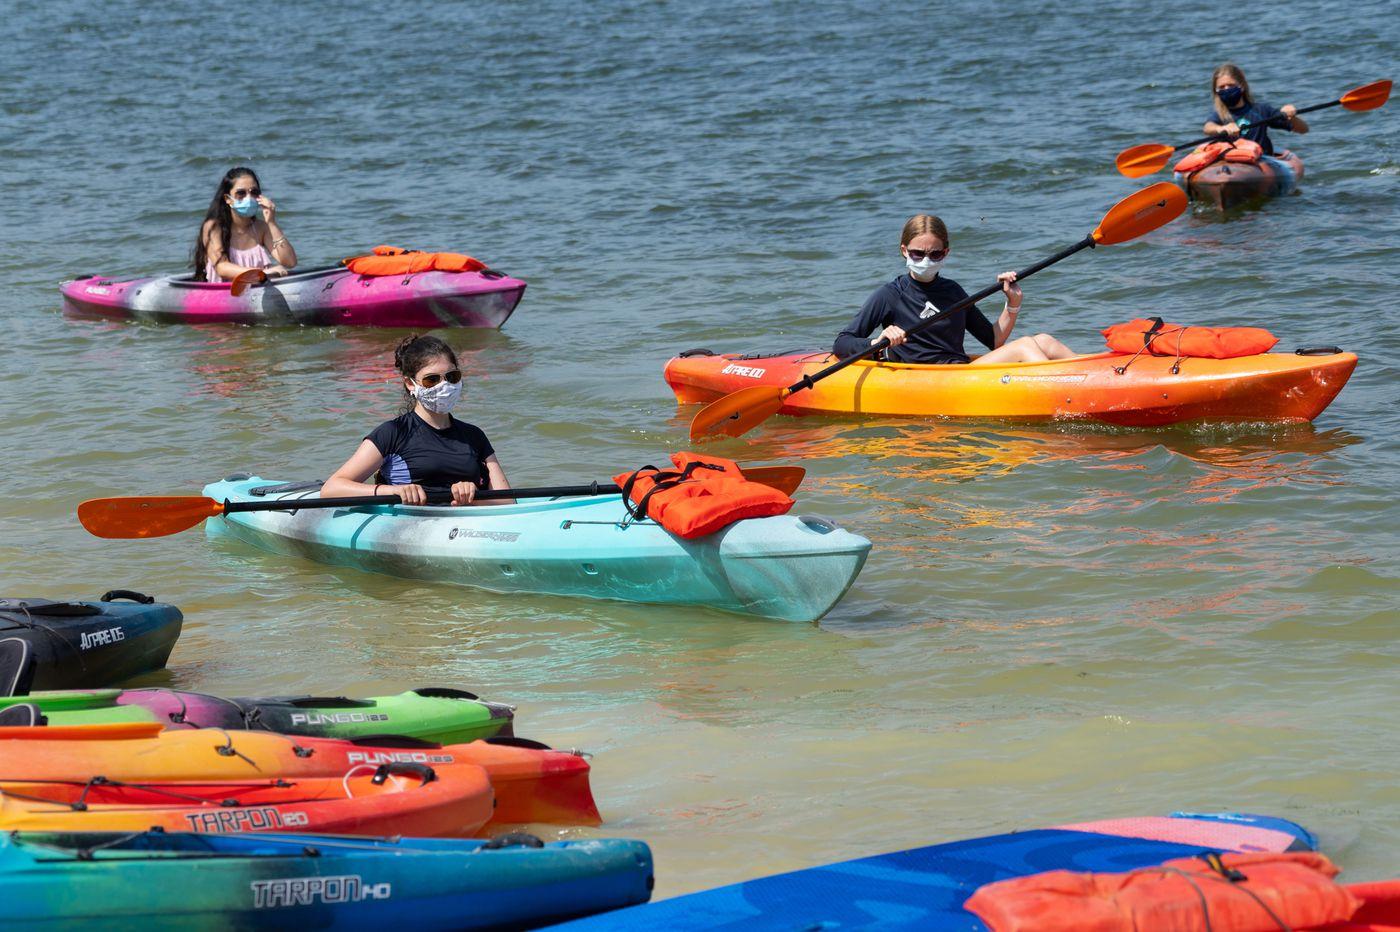 Thinking of buying a kayak? Coronavirus demand makes them hard to find